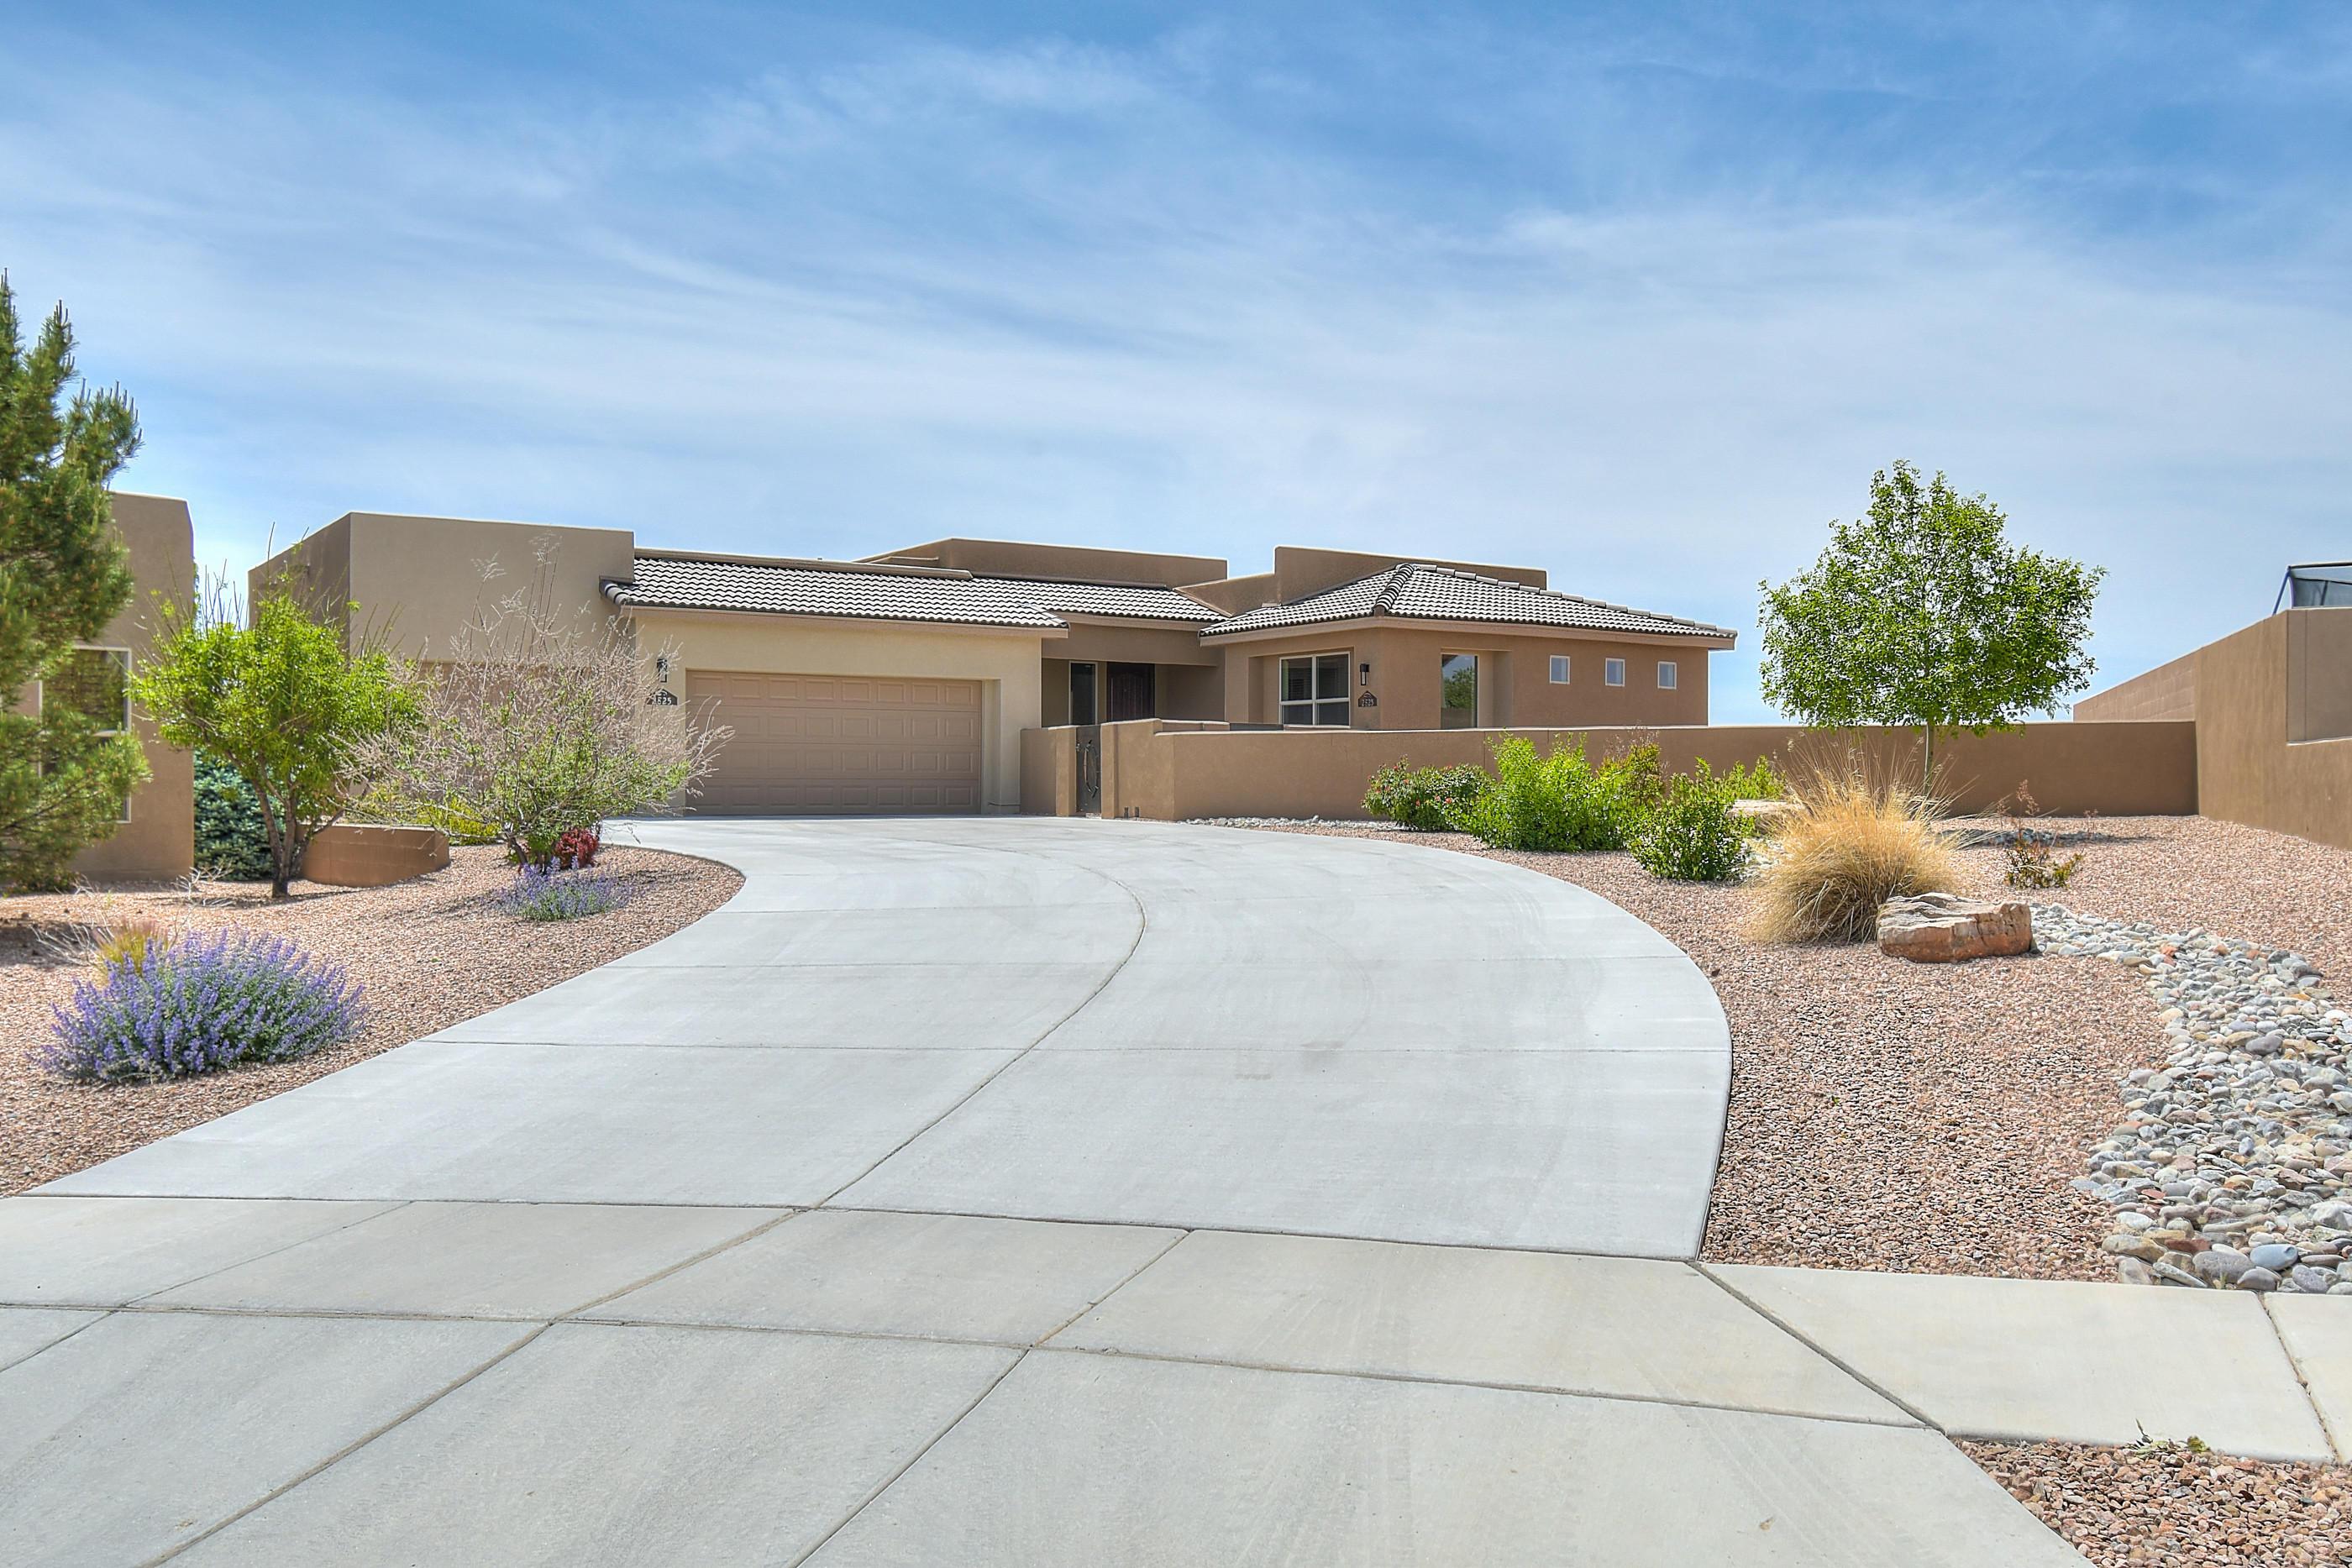 2825 Redondo Santa Fe Ne Property Photo